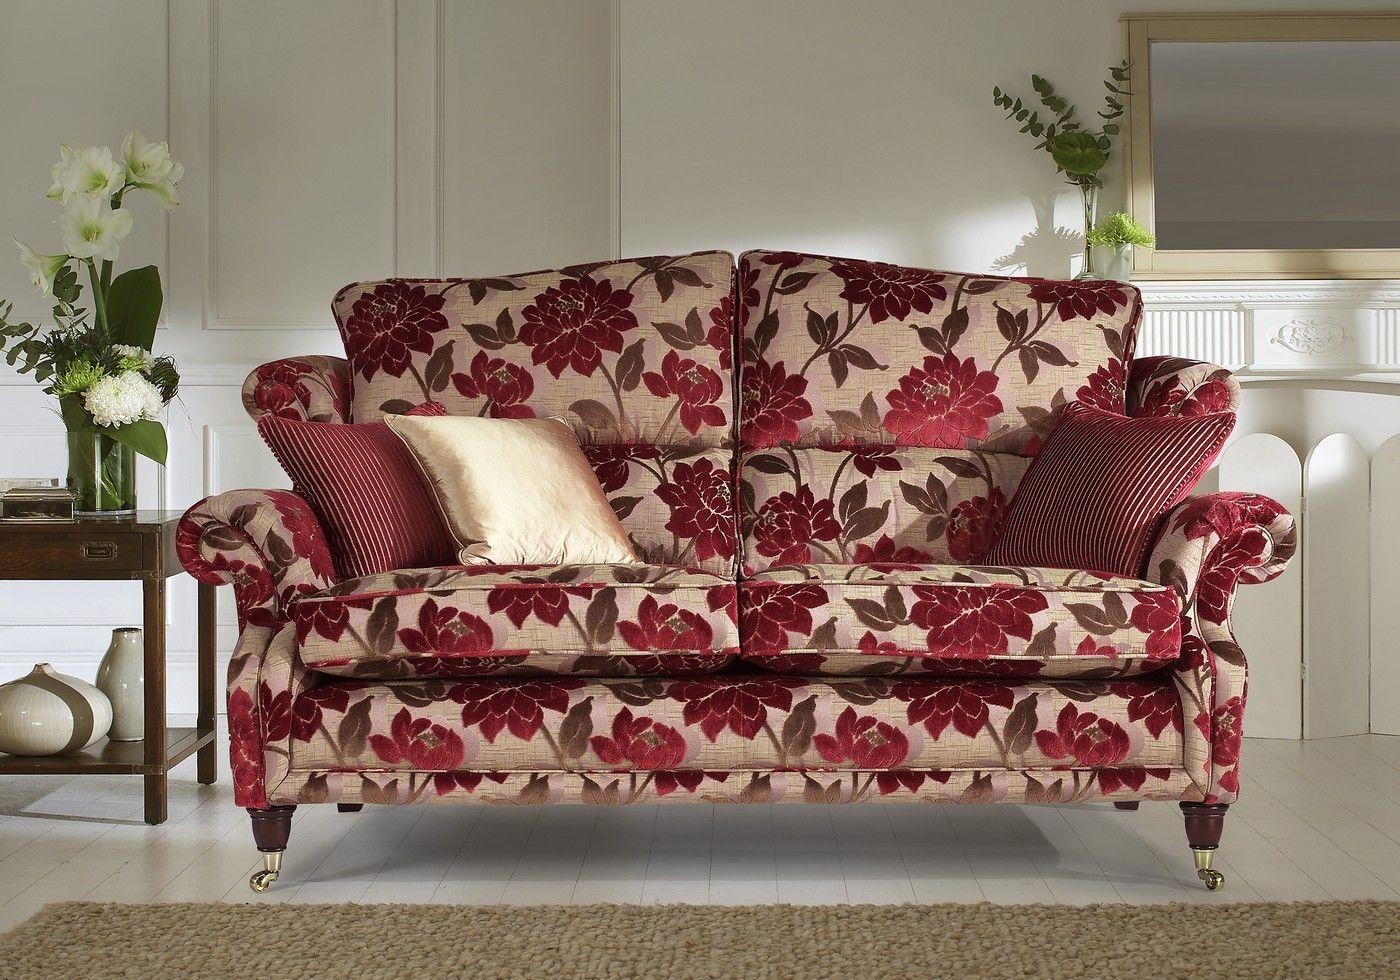 Wade Hollinwell Large High Back Sofa (With images) | Sofa ...